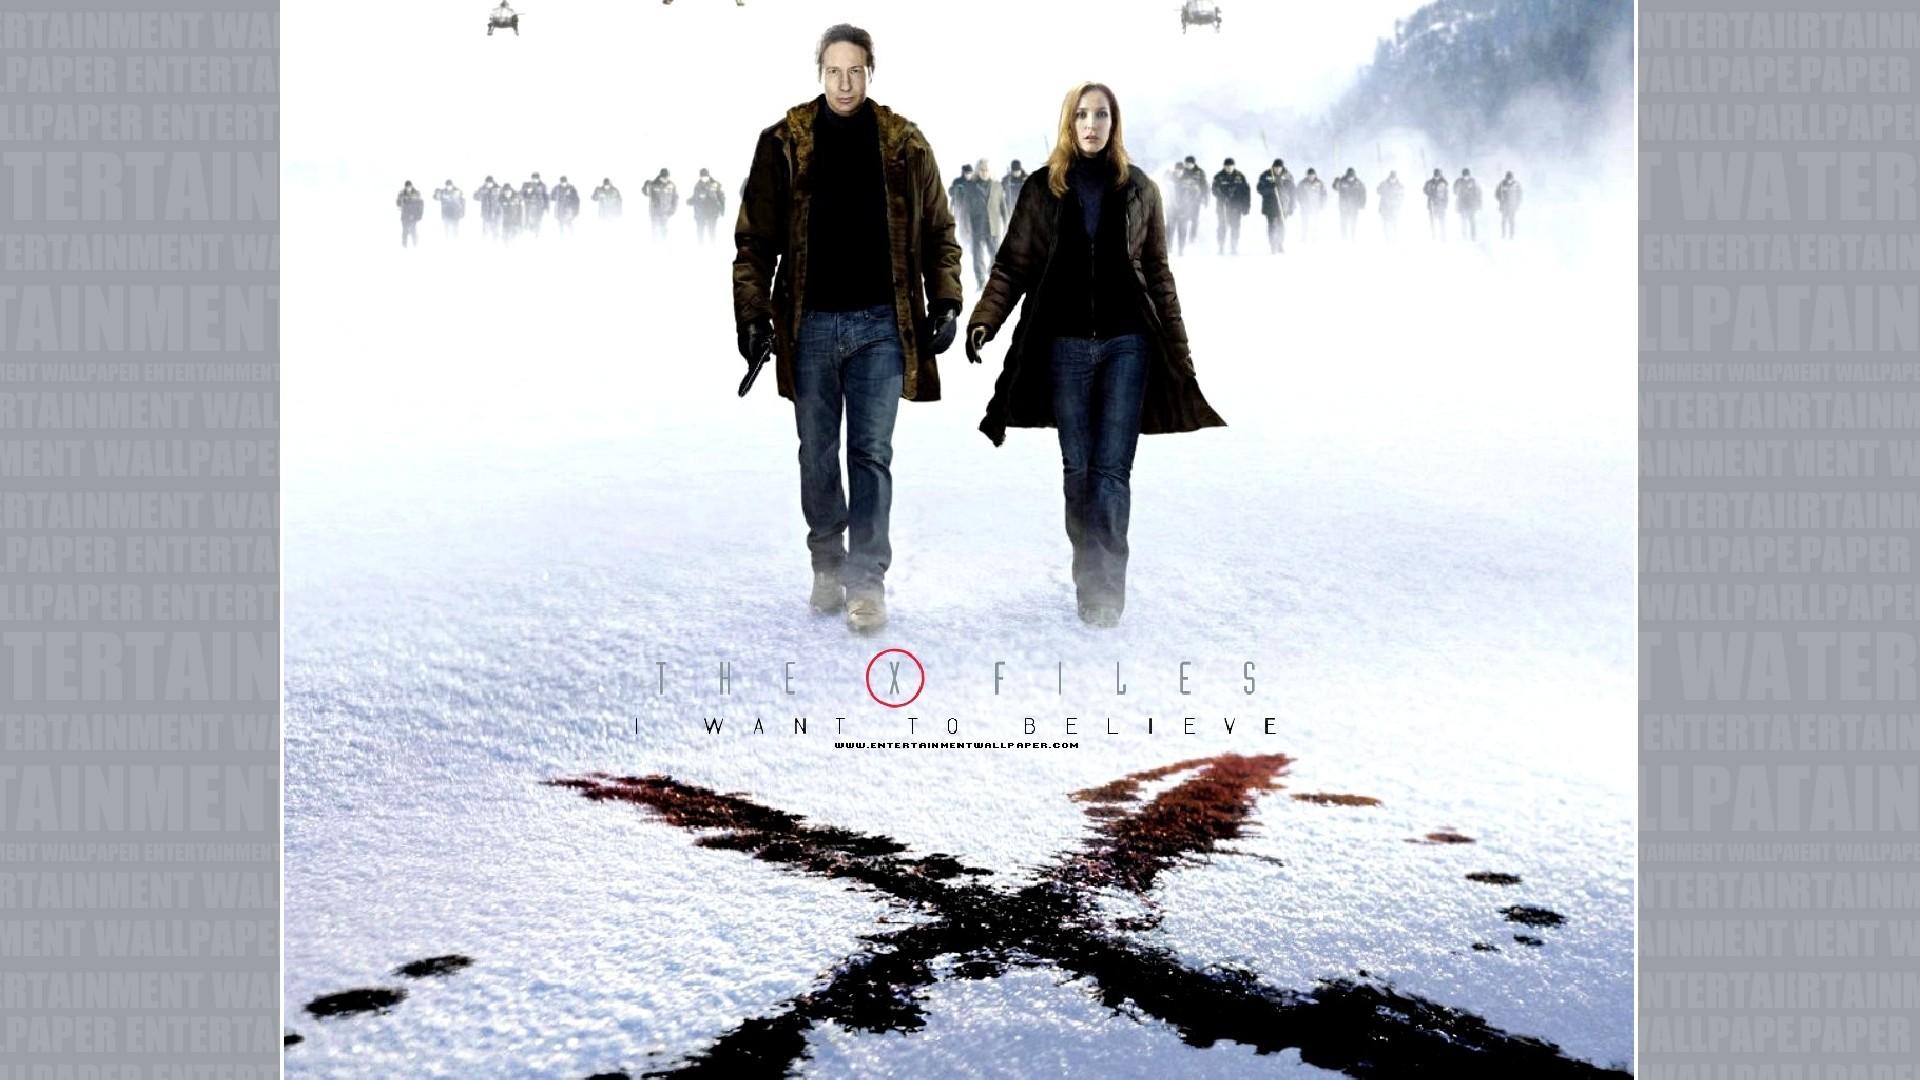 X Files Wallpaper Hd 65 Images